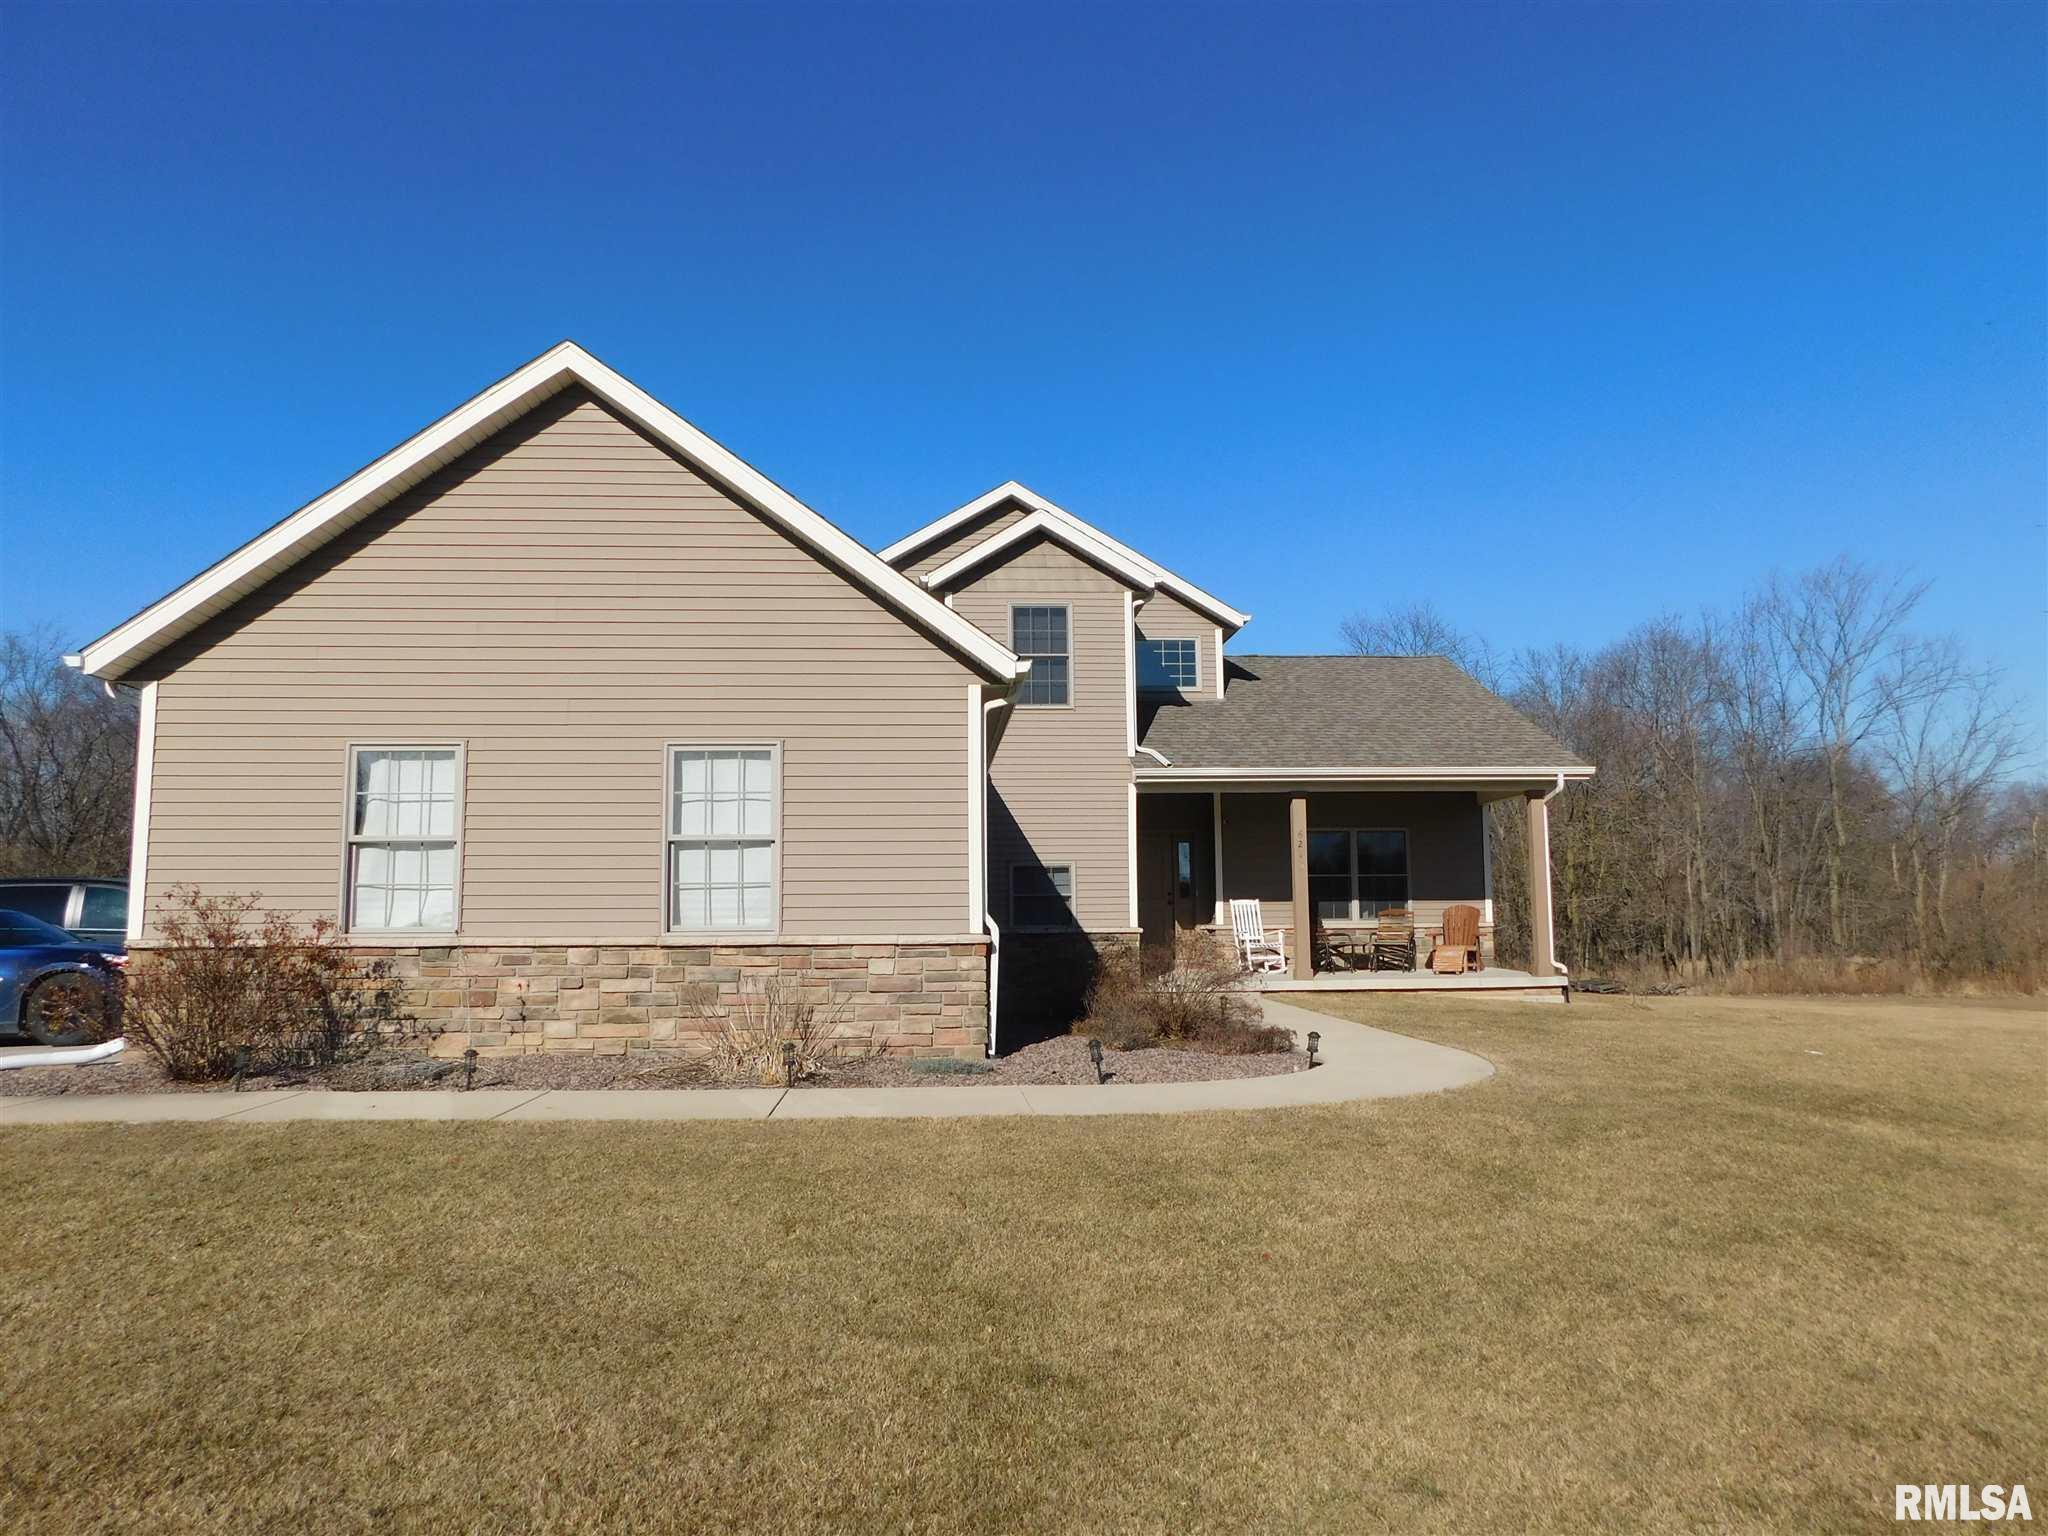 8210 W VICKI LYNN Property Photo - Mapleton, IL real estate listing